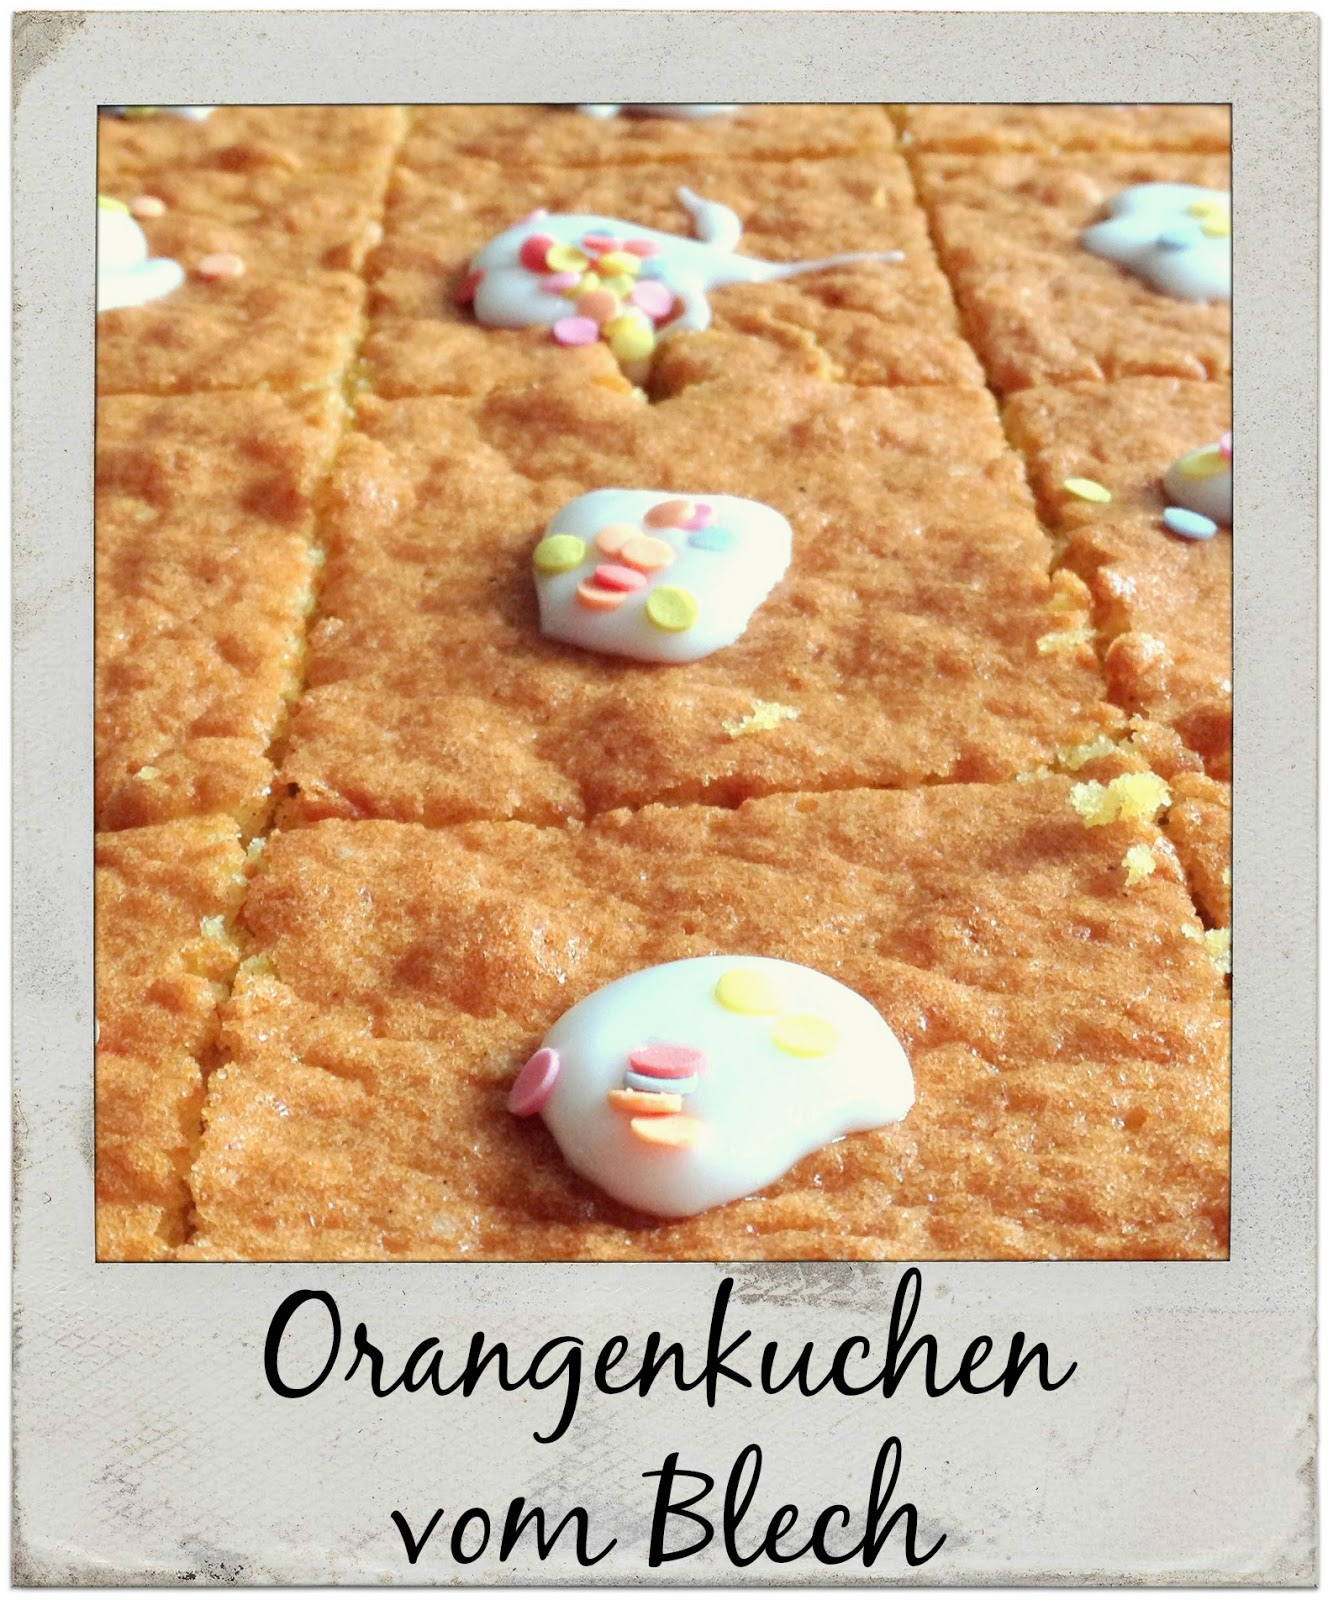 http://gemachtesundgedachtes.blogspot.de/2014/07/saftiger-orangenkuchen-vom-blech.html